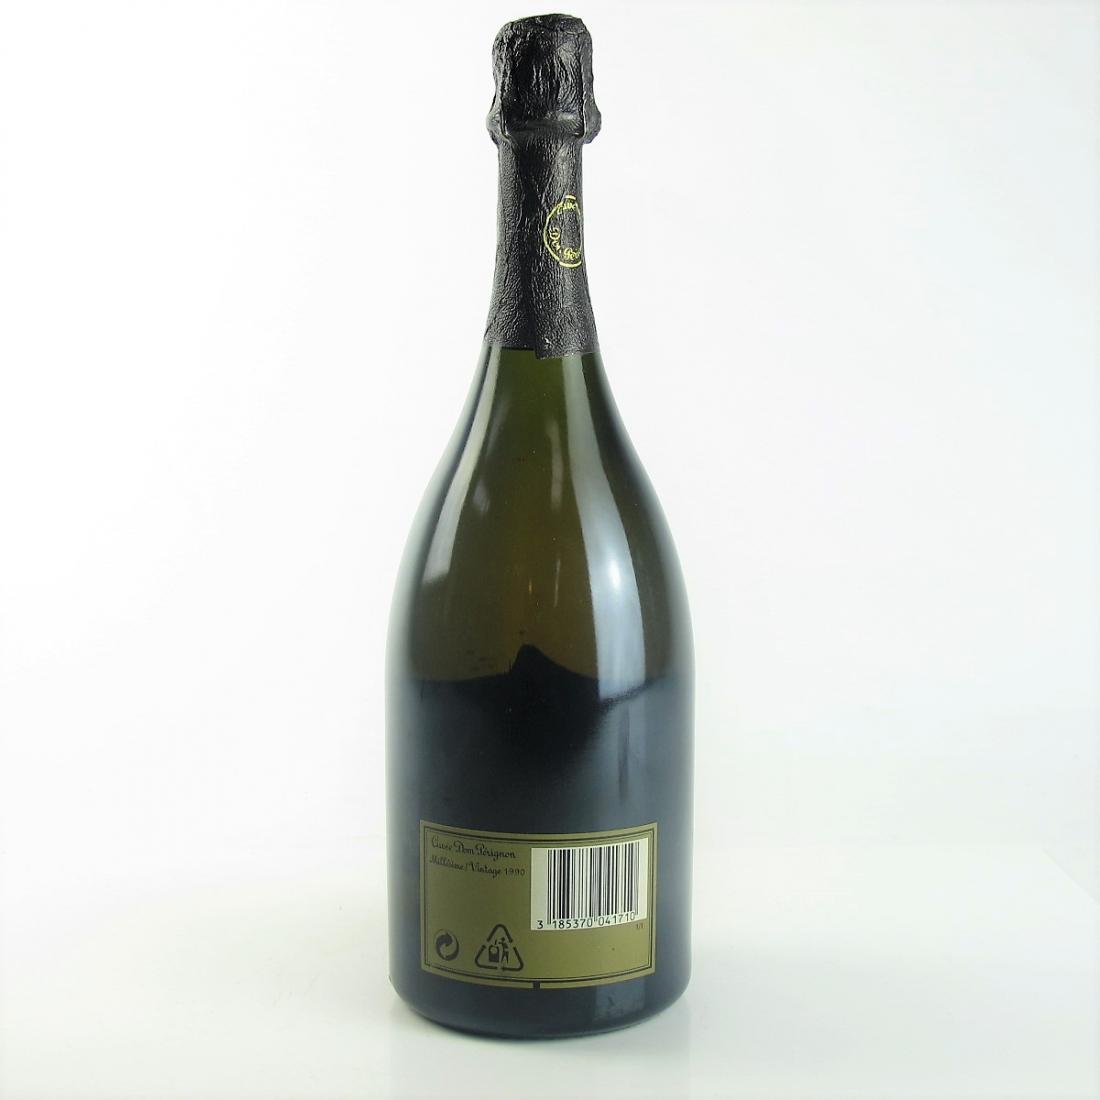 Dom Perignon Brut Vintage 1990 Champagne